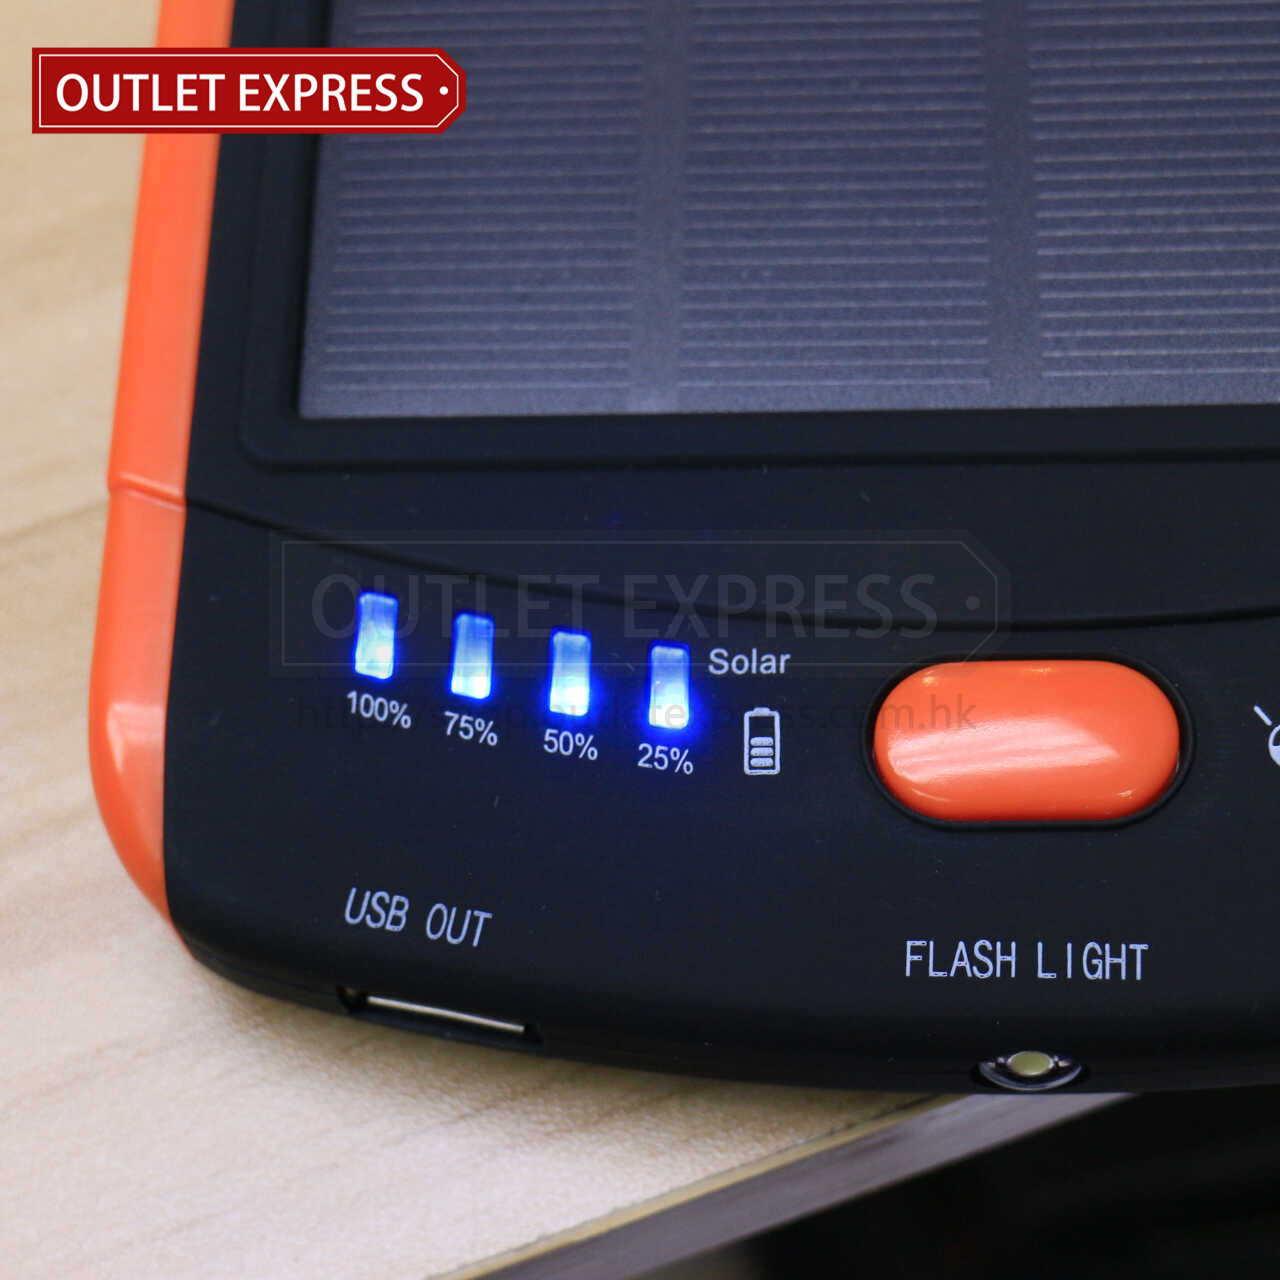 23000mAH 超薄太陽能移動電源 電源顯示- Outlet Express HK 生活百貨城實拍圖